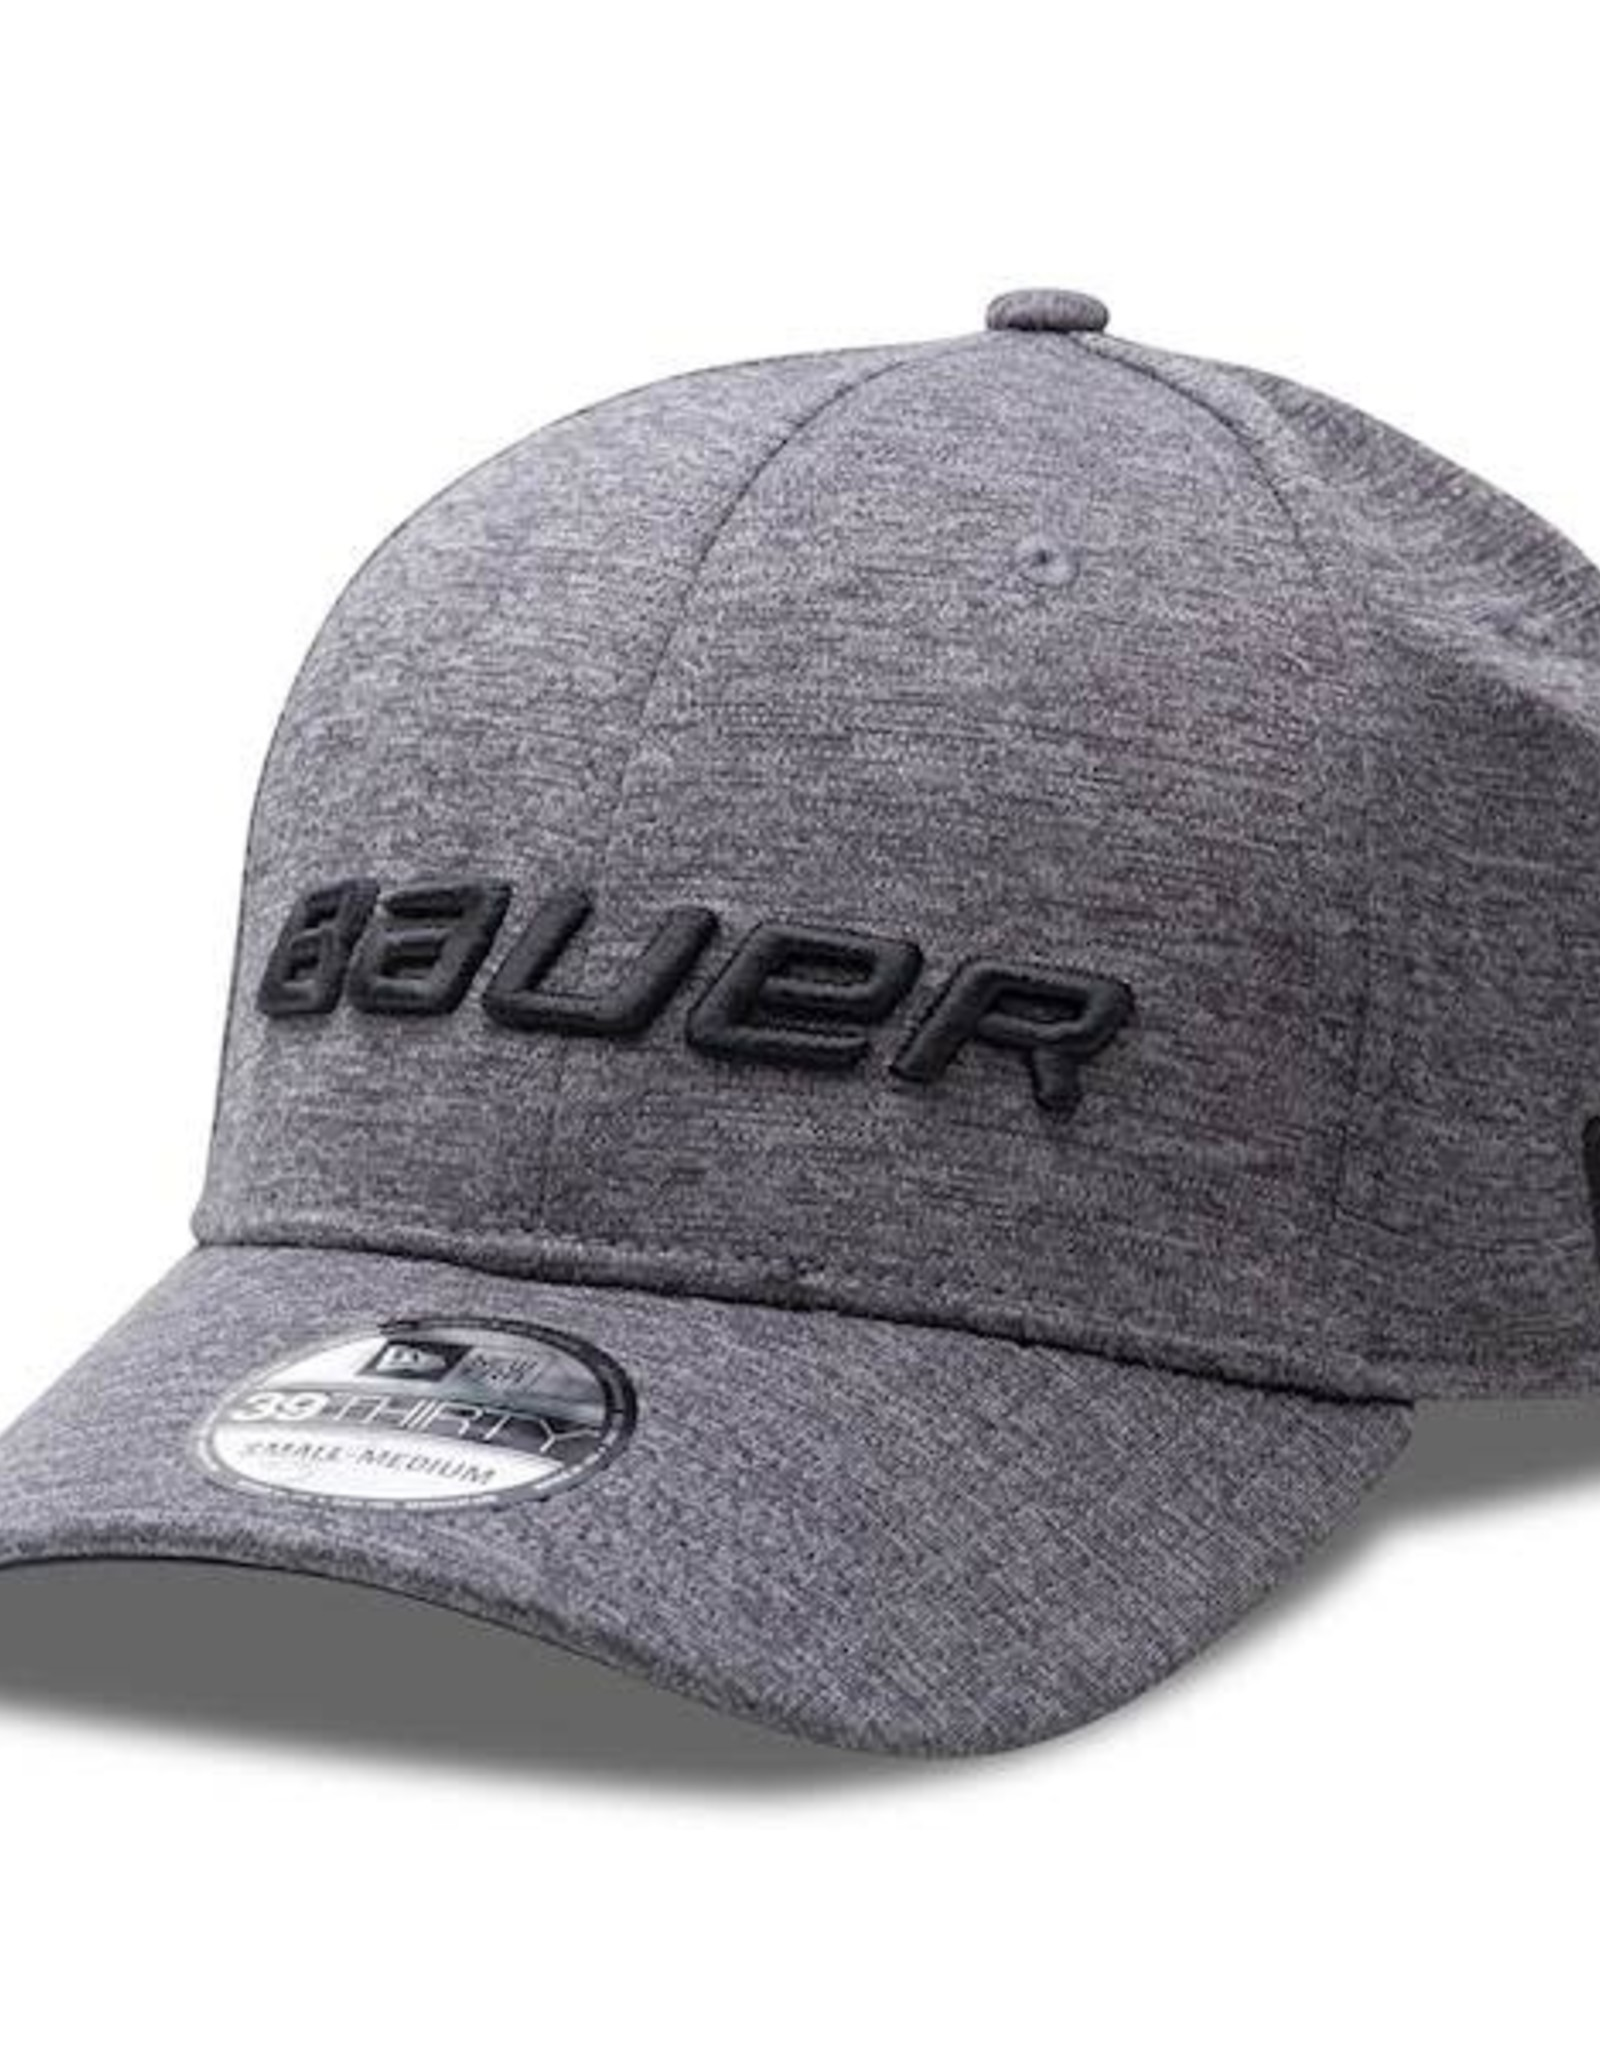 Bauer Bauer Shadow Tech 39Thirty Grey